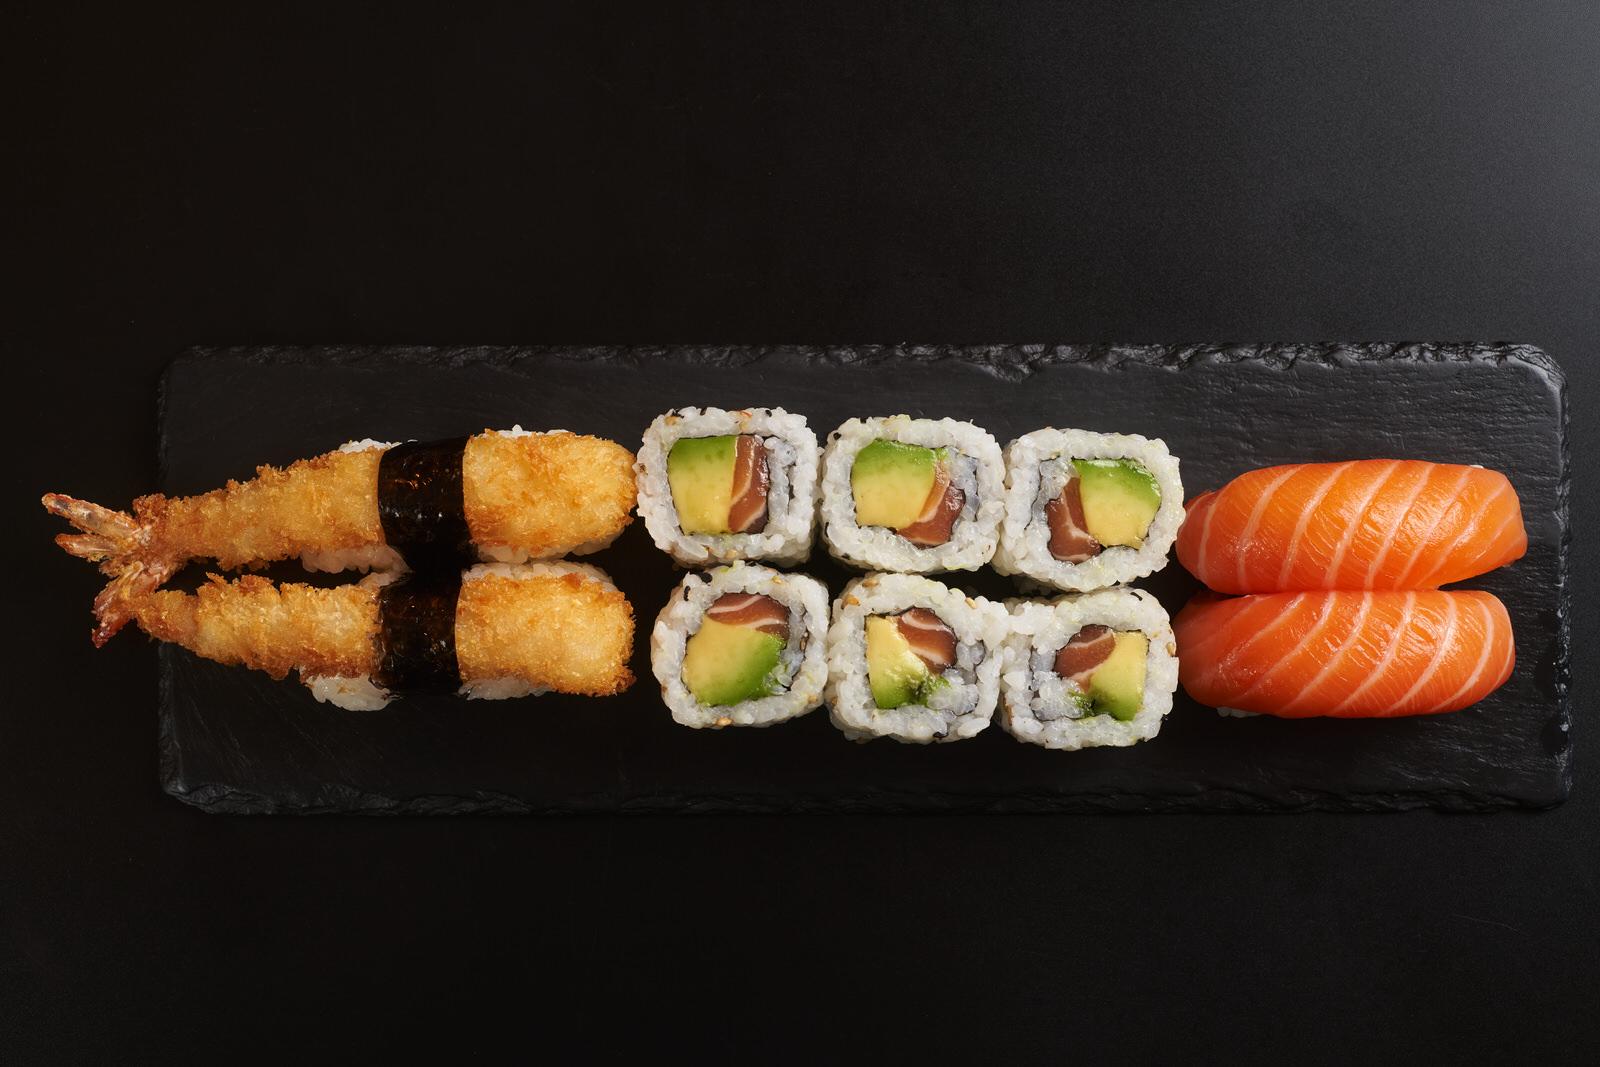 Sushi - Photo culinaire - Photographe culinaire - Bordeaux - Gironde - photographe professionnel